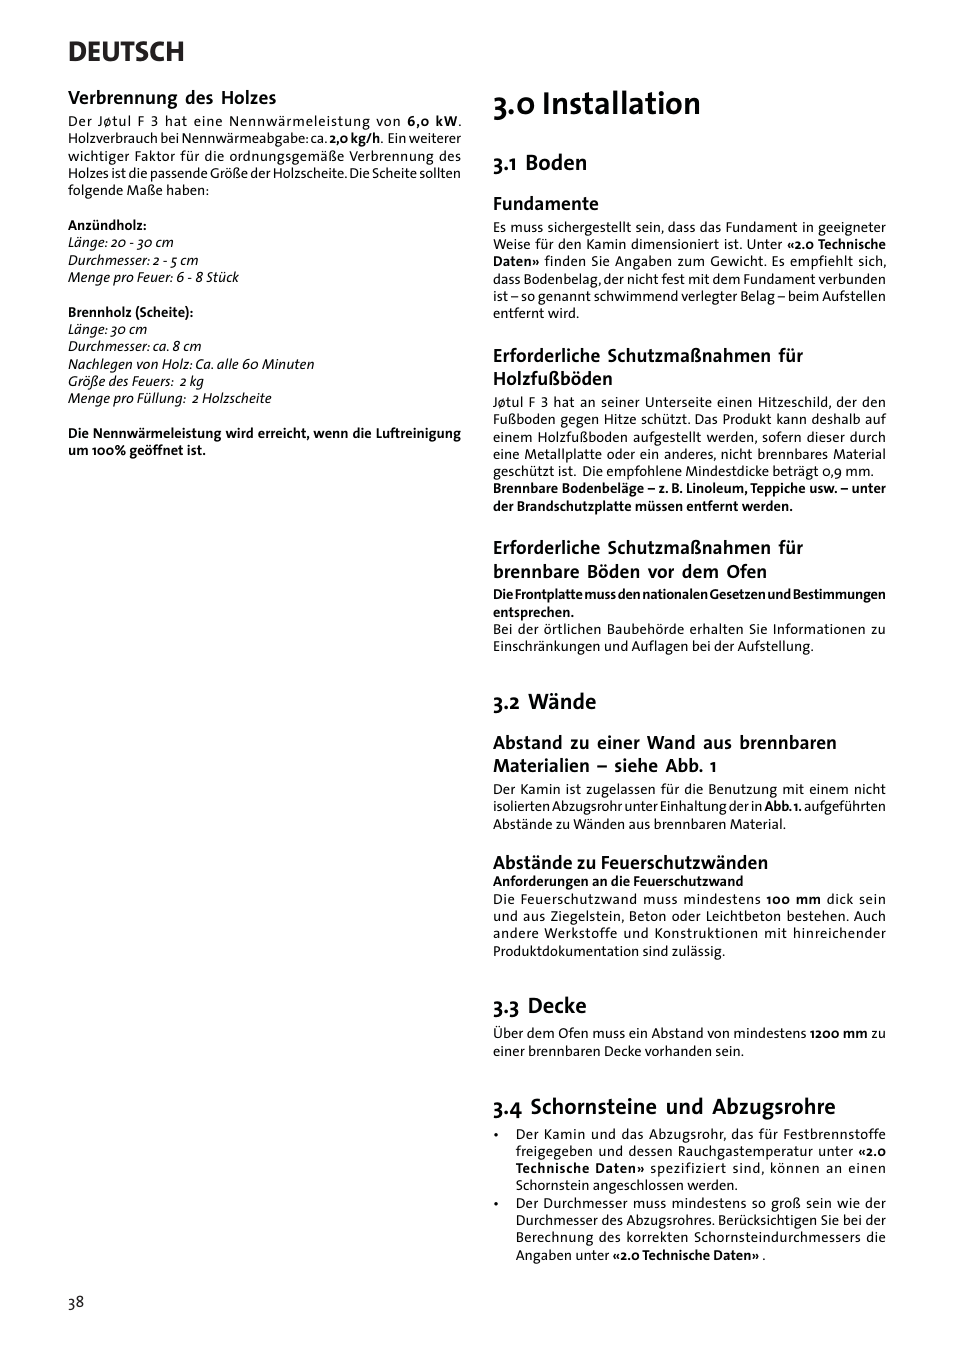 Ofenrohr Durch Holzdecke Finest Ofenrohr Durch Holzdecke With